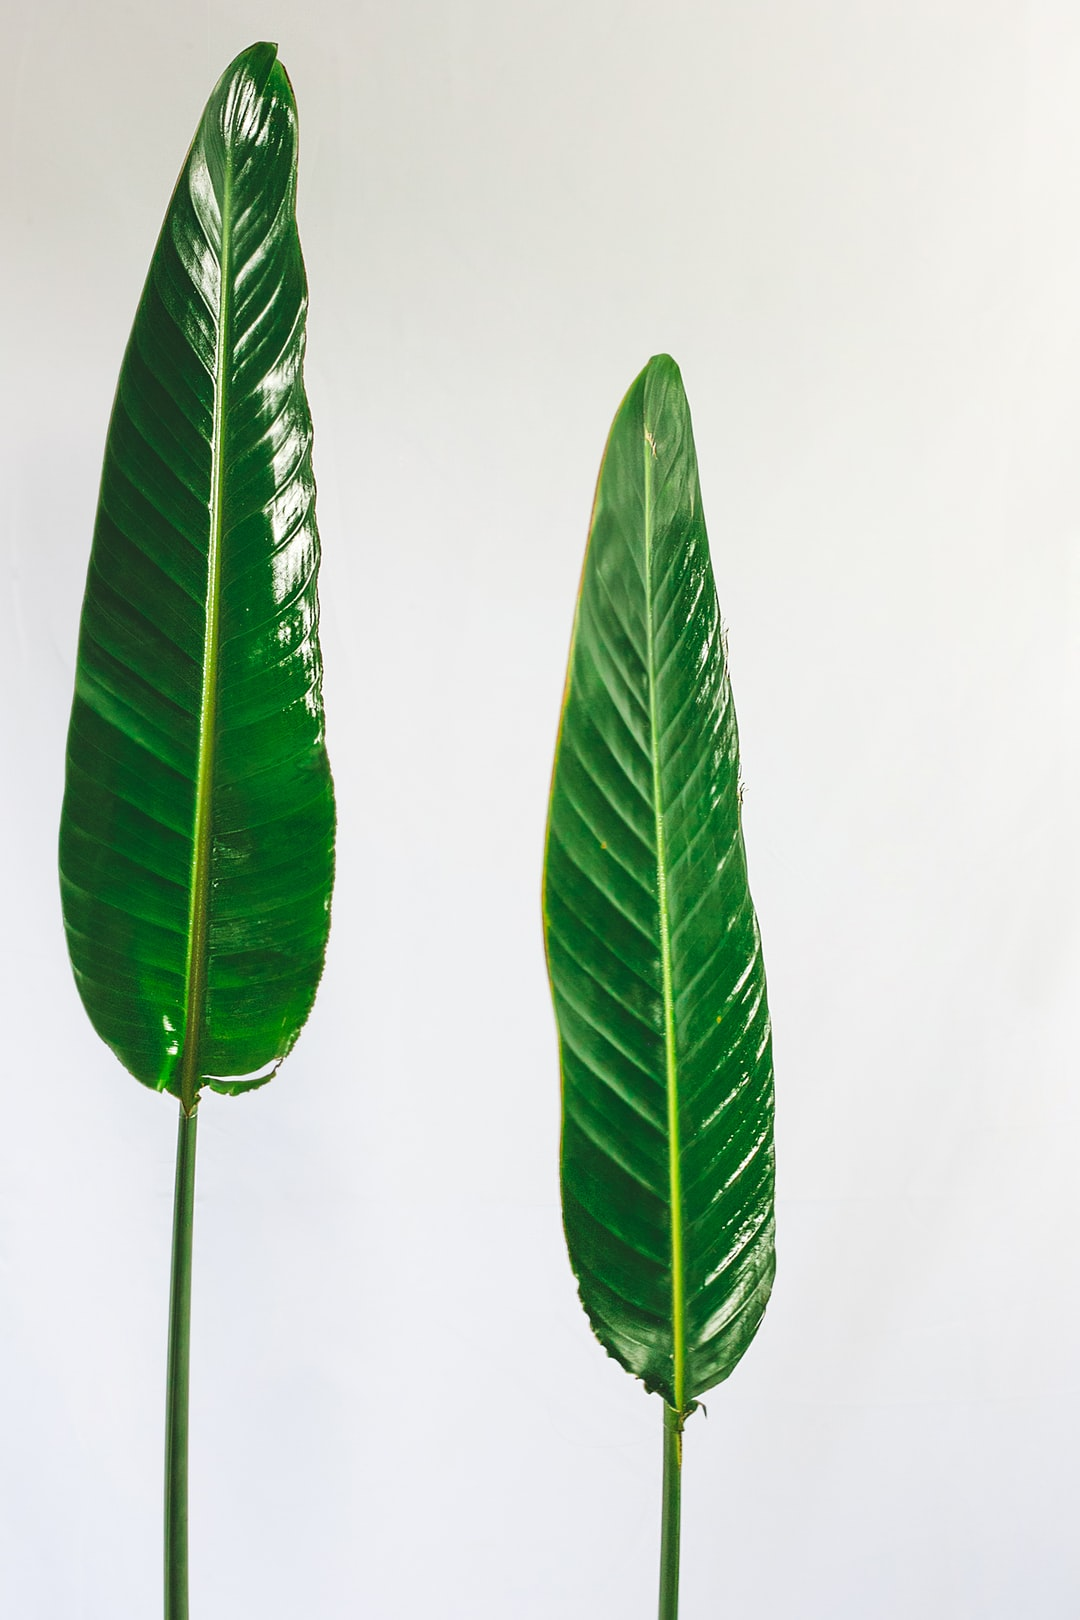 Two Strelitzia leaves